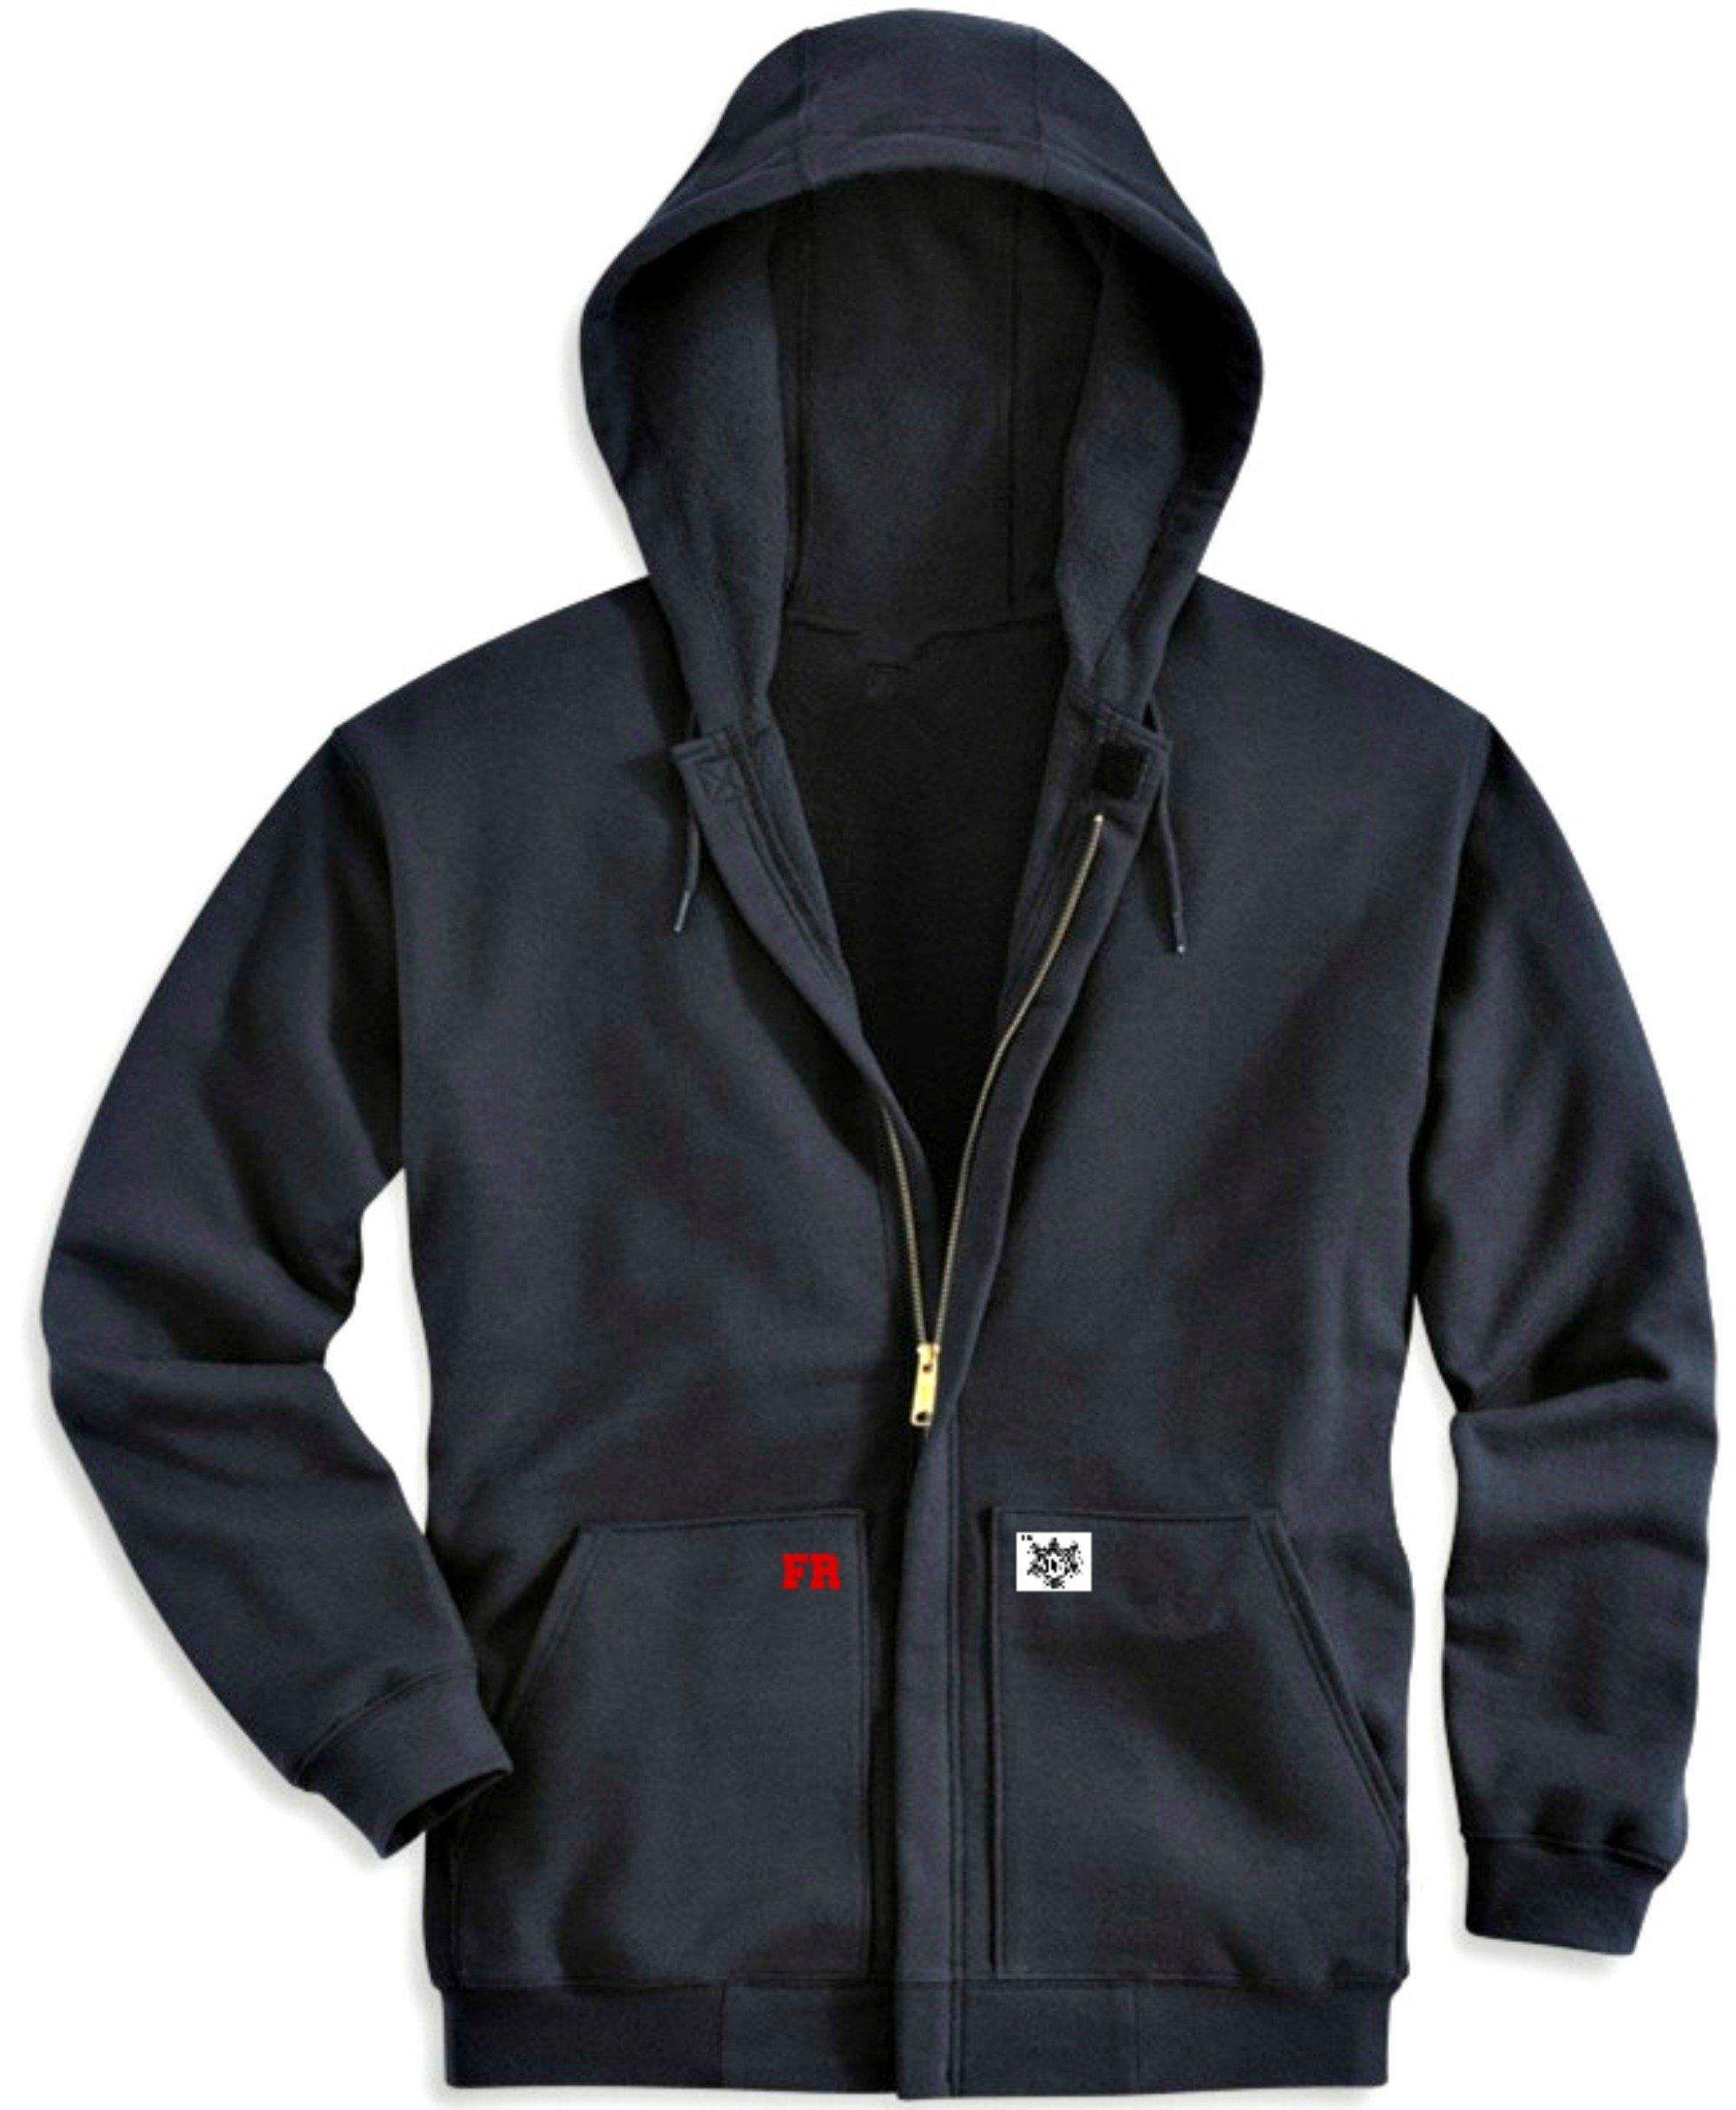 Dave Ocean33 Durable Fire Resistant 12oz Hoodie FR Sweatshirt With Full Front Zipper, HRC2. 100% Cotton, Black (XLarge)